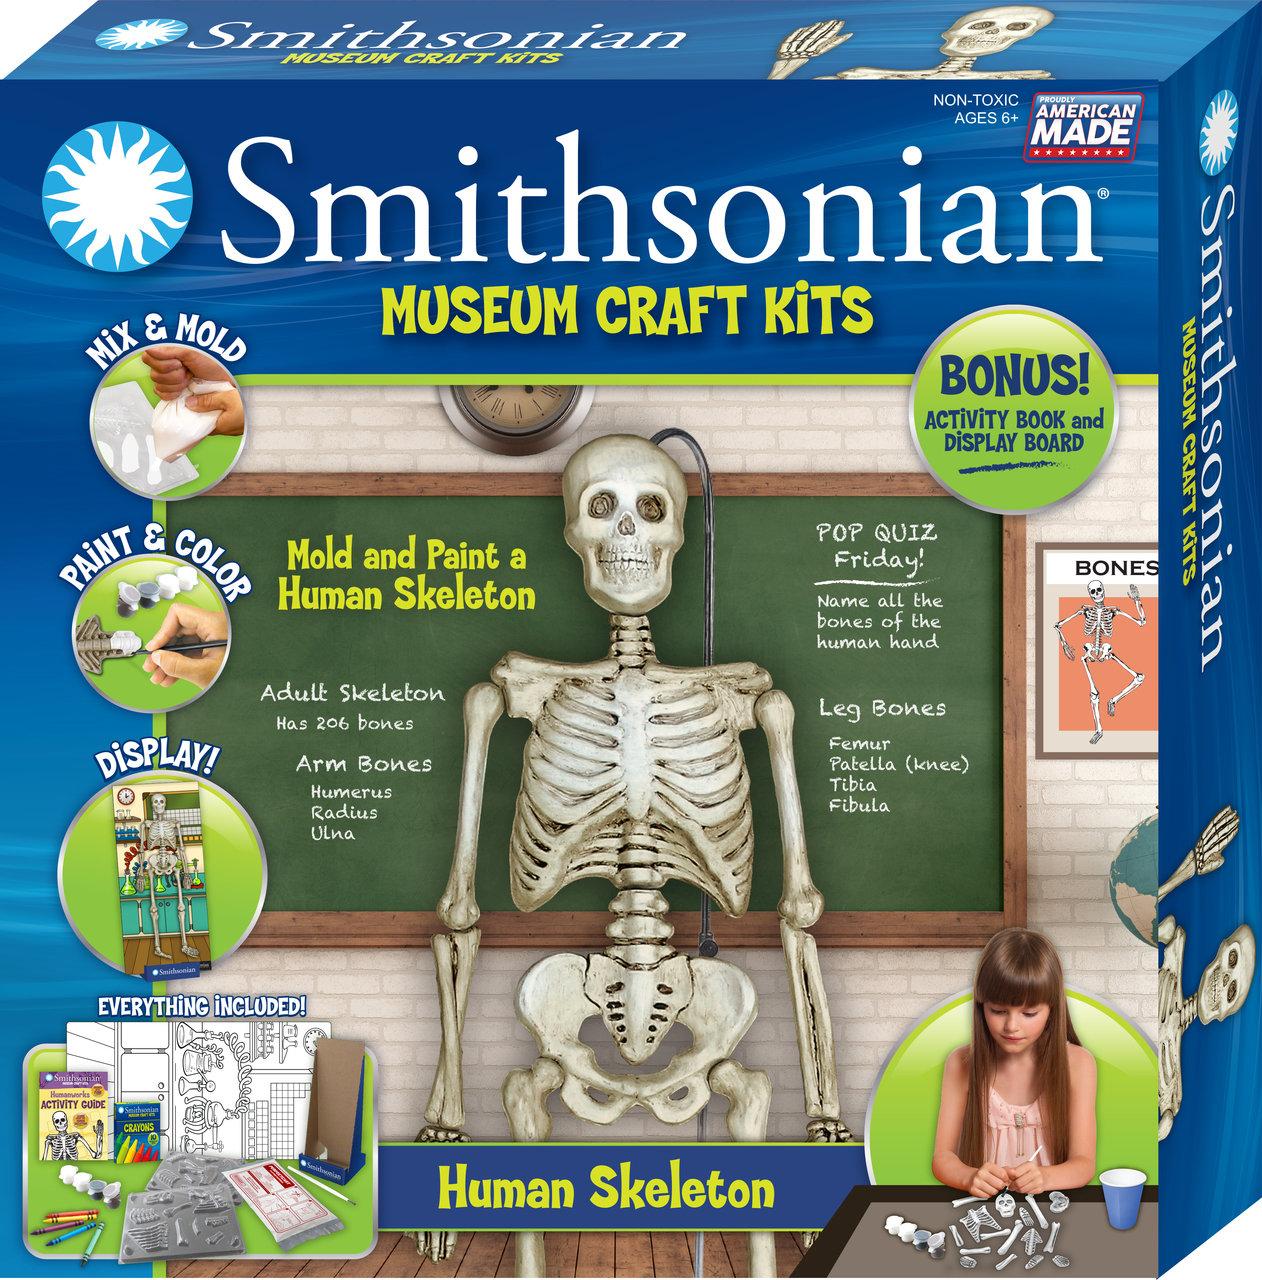 Smithsonian Human Skeleton Casting Kit